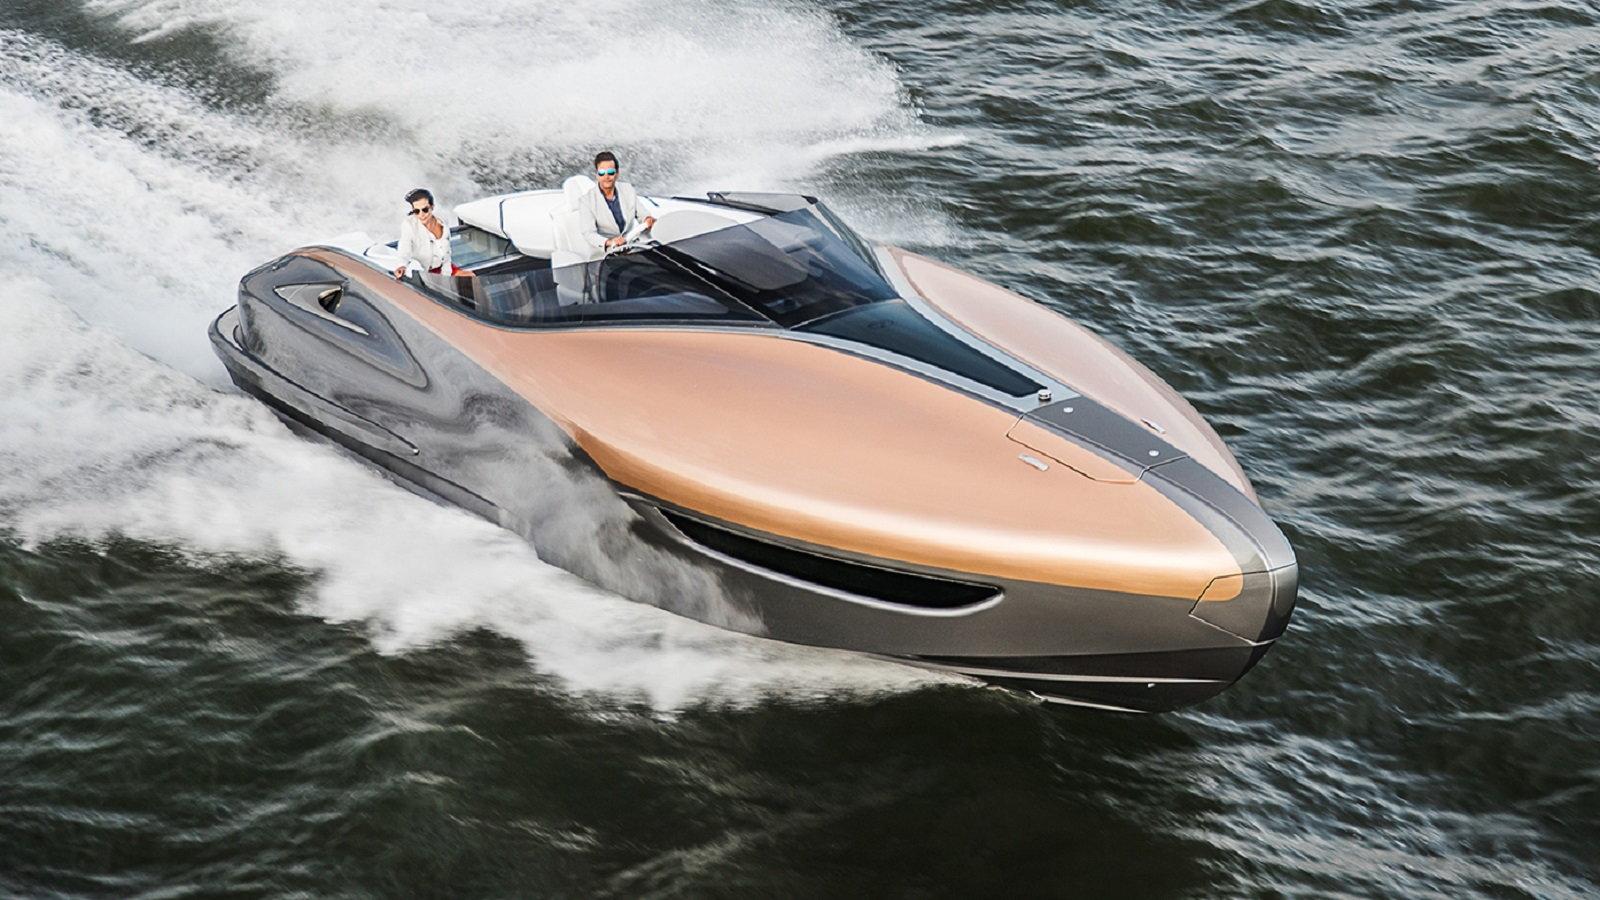 Lexus Announces Plans to Sell Sport Yacht